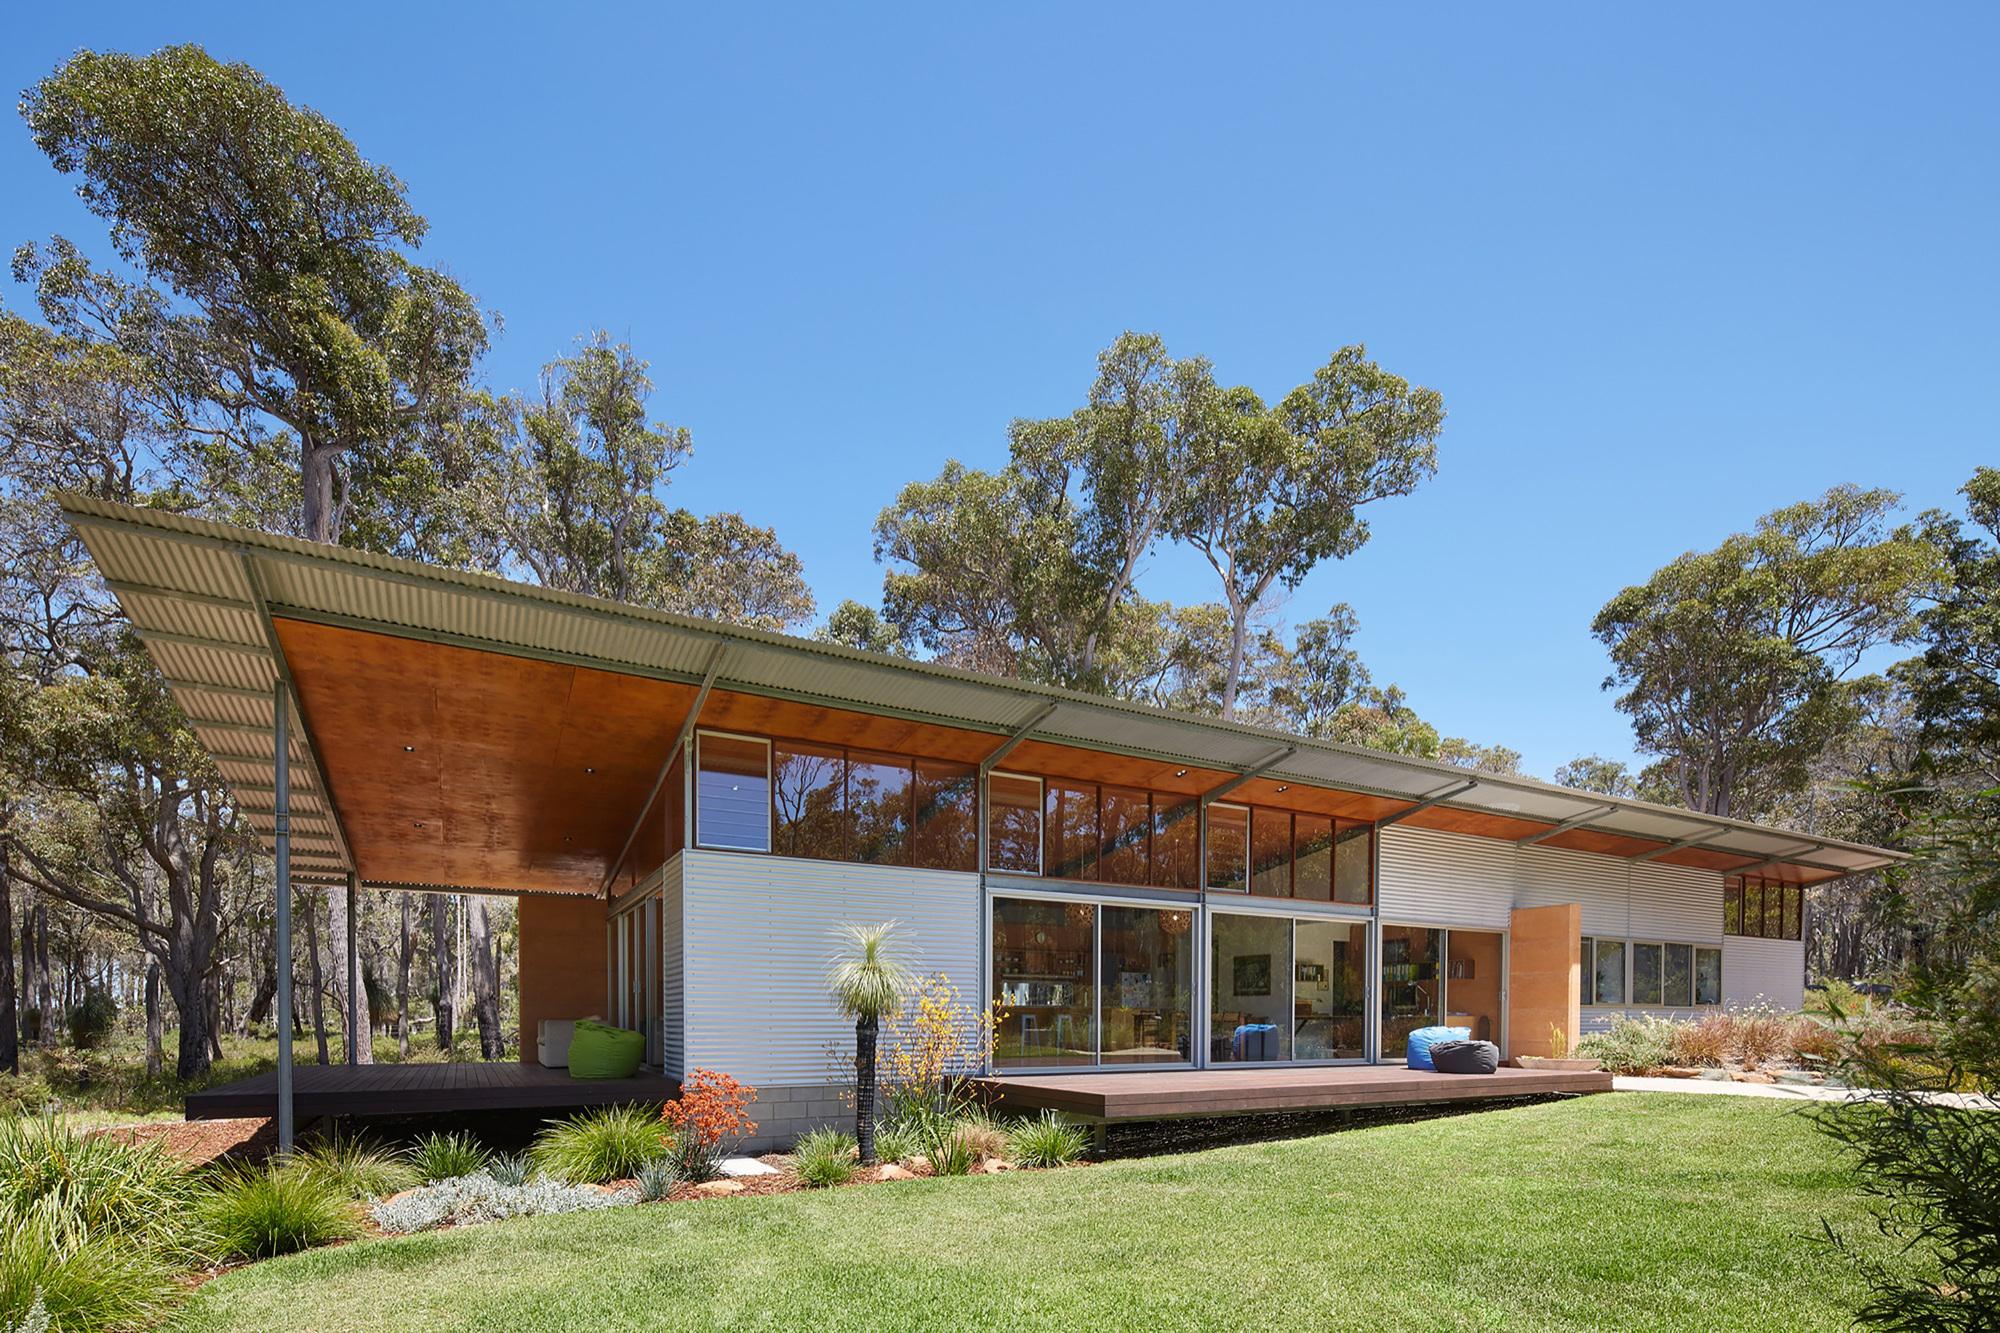 Gallery of bush house archterra architects 20 for Pavillion home designs australia